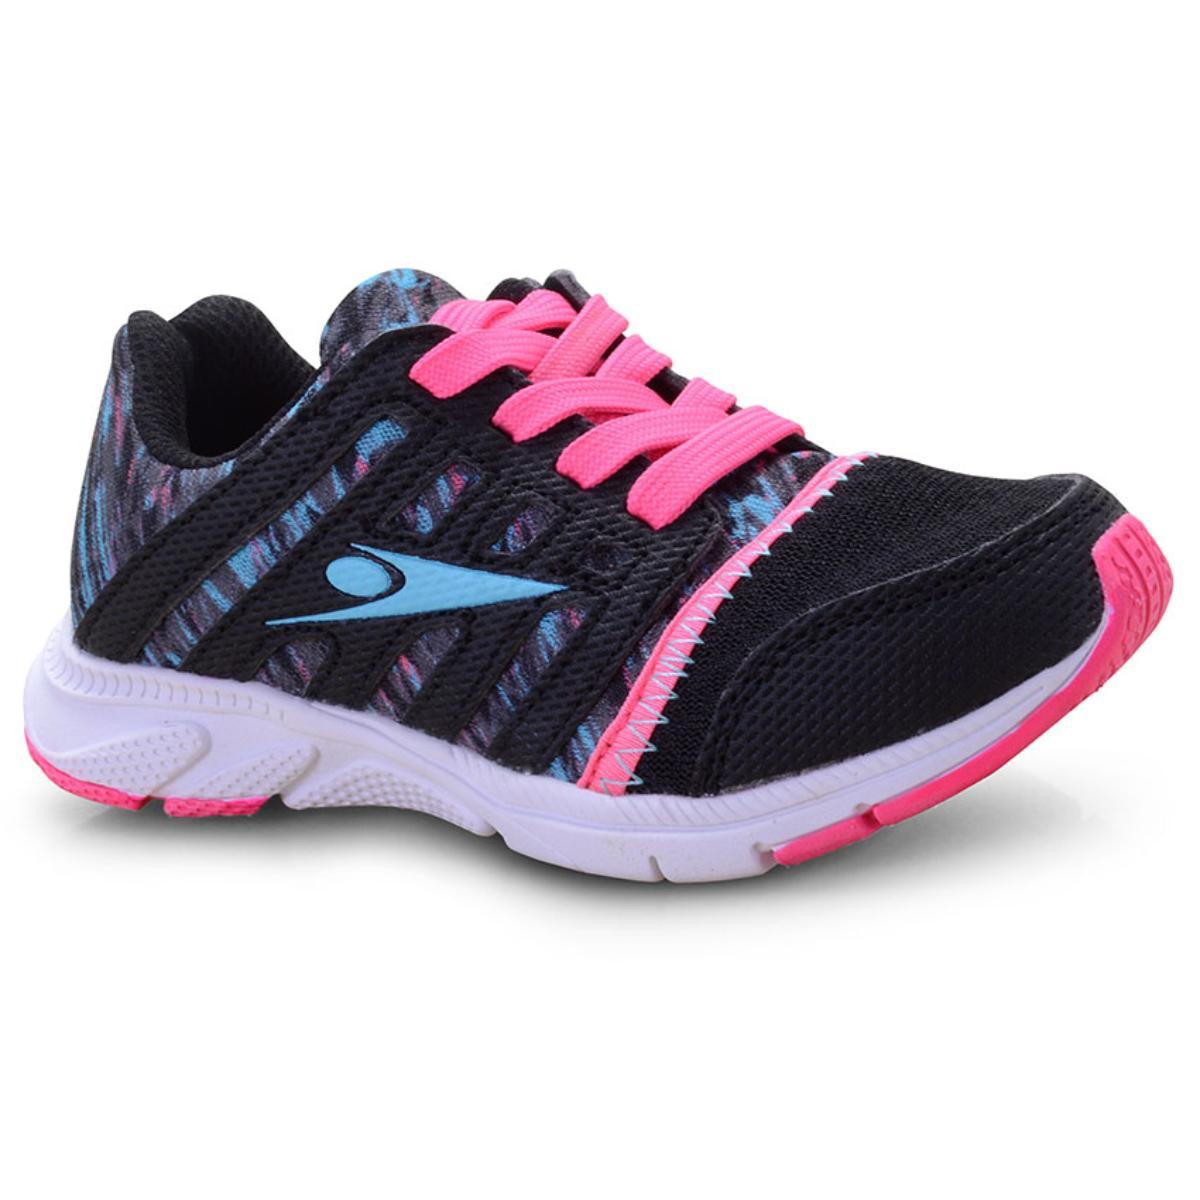 Tênis Fem Infantil Klin 143.024 Preto/pink